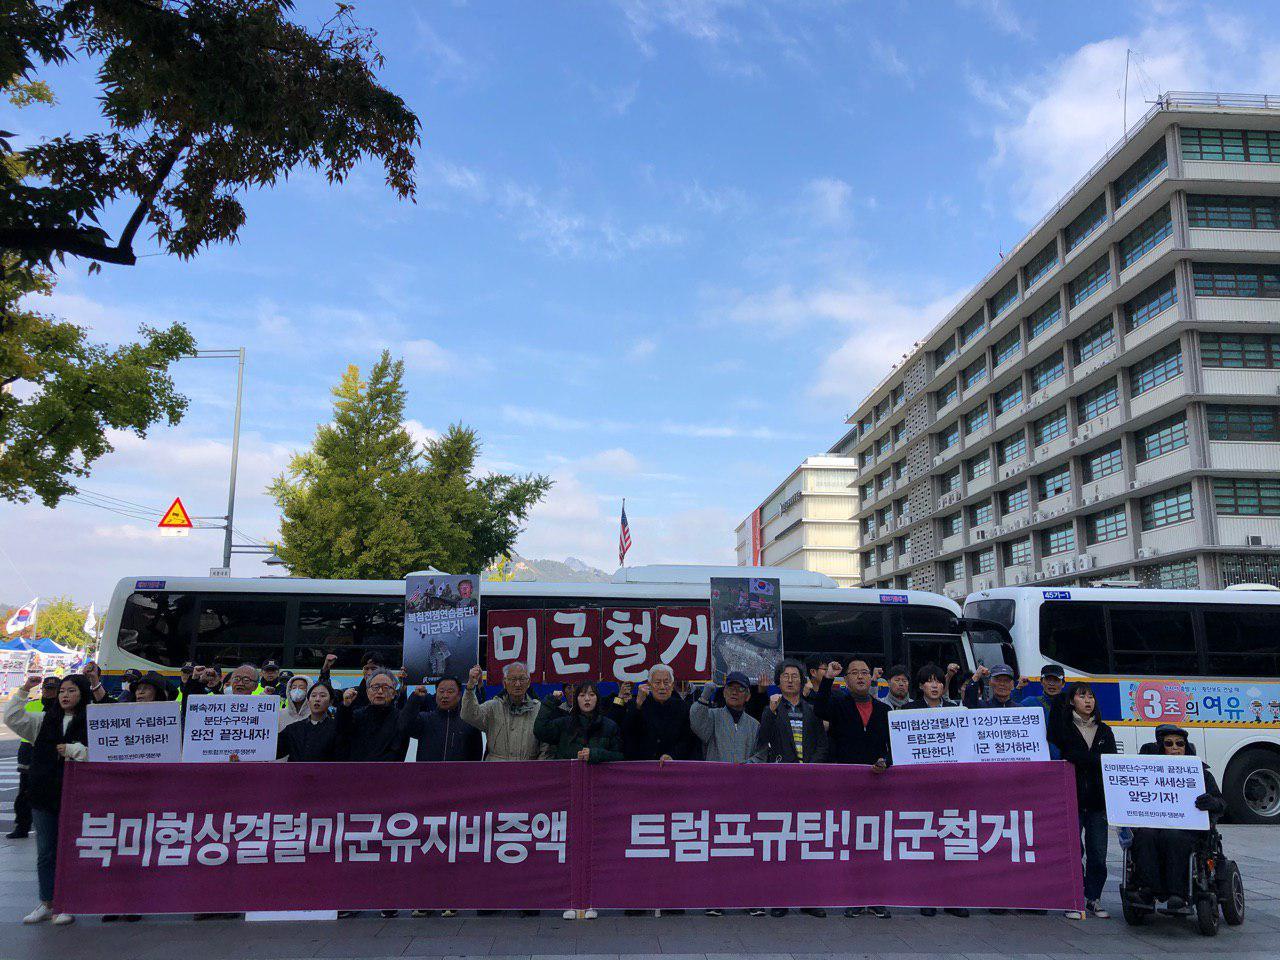 photo_2019-10-26_04-16-16.jpg